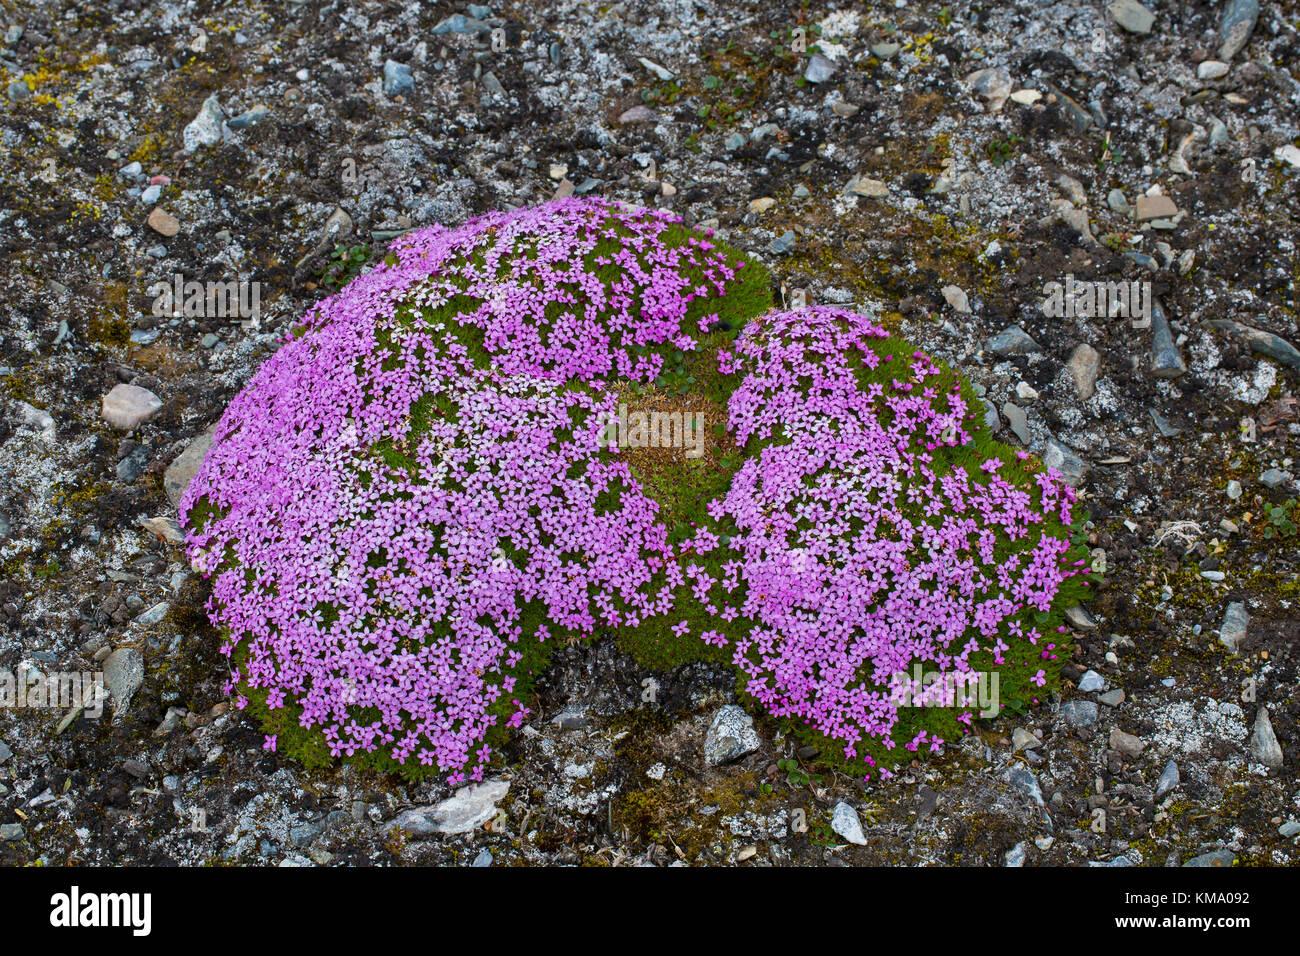 Moss campion / cushion pink (Silene acaulis) in flower in summer on the arctic tundra, Svalbard / Spitsbergen, Norway - Stock Image